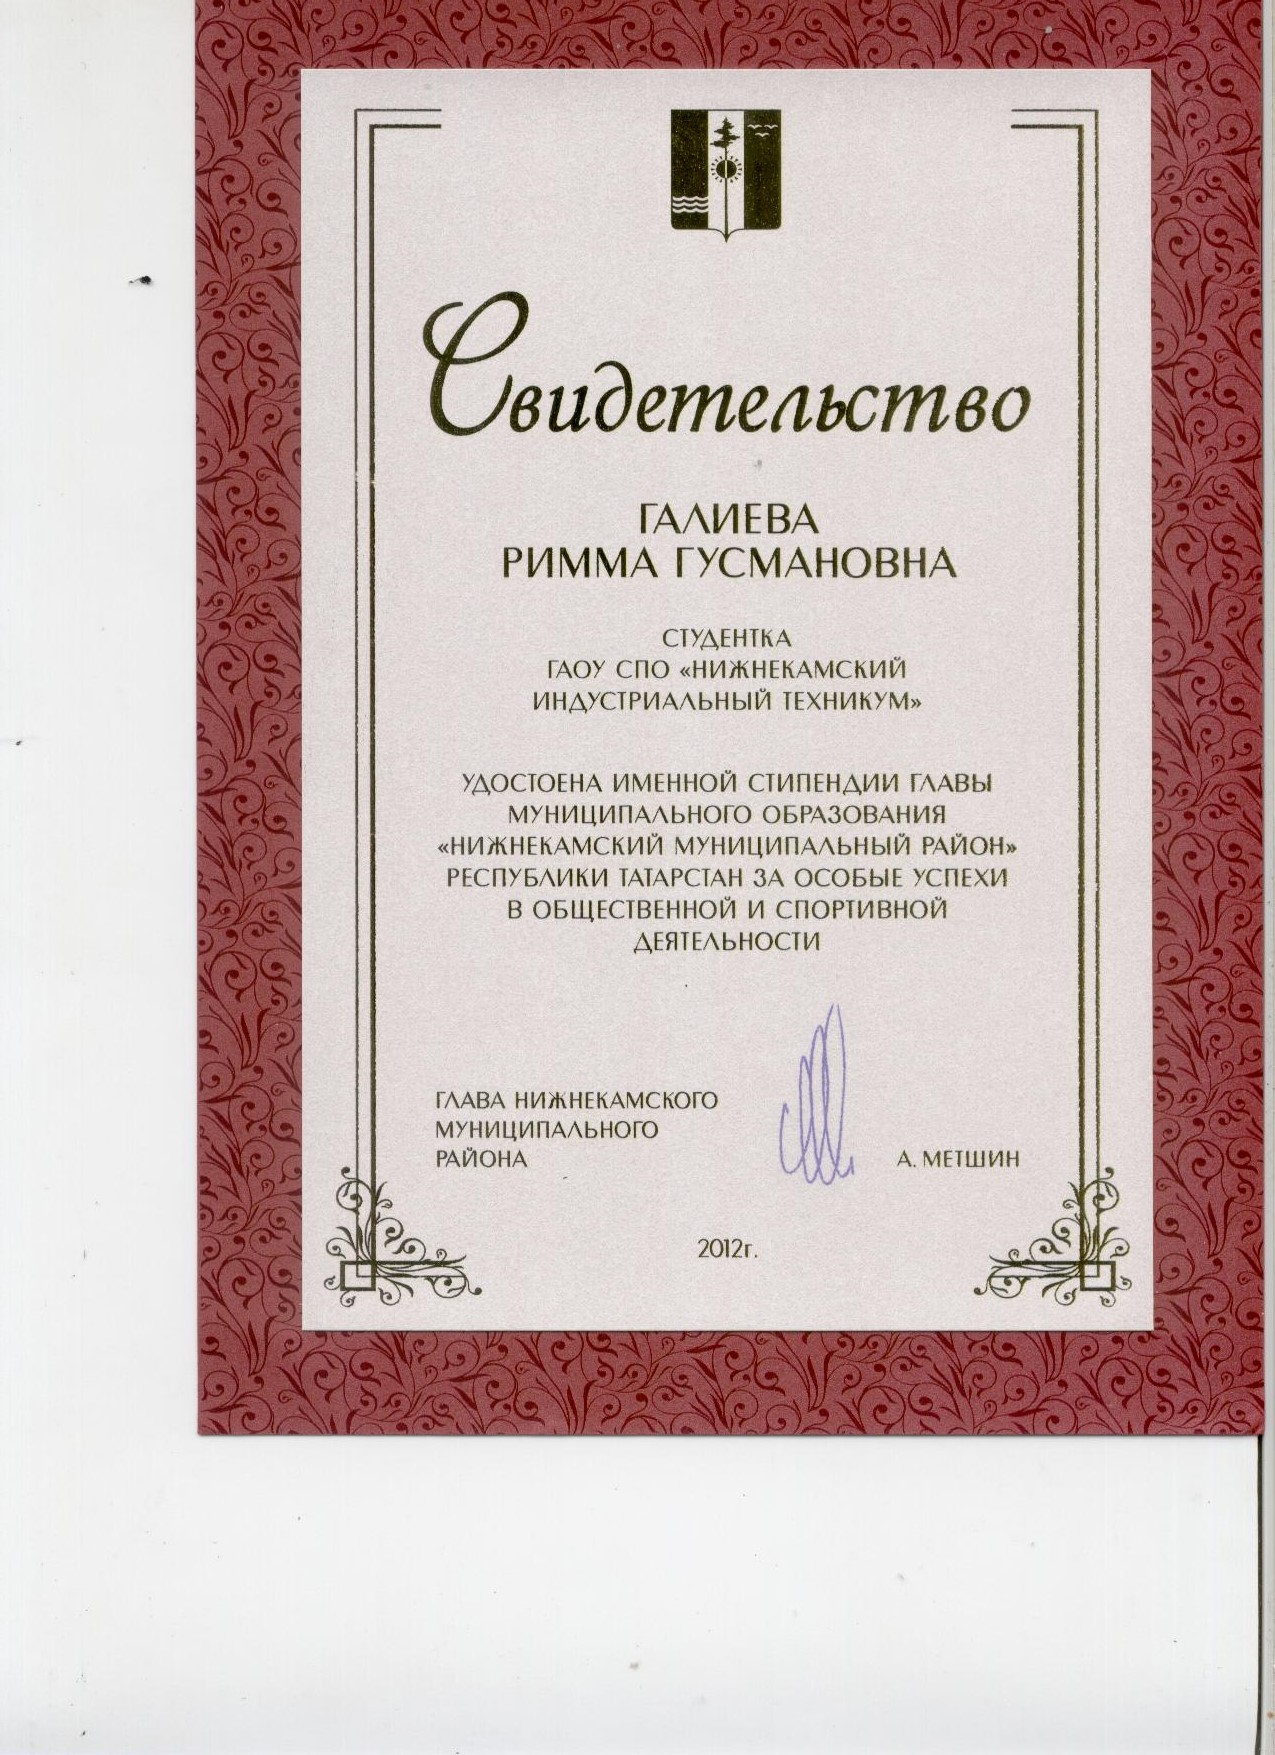 F:\Всероссйский конкурс Портфолио выпускника\РИММА\Римма 018.jpg